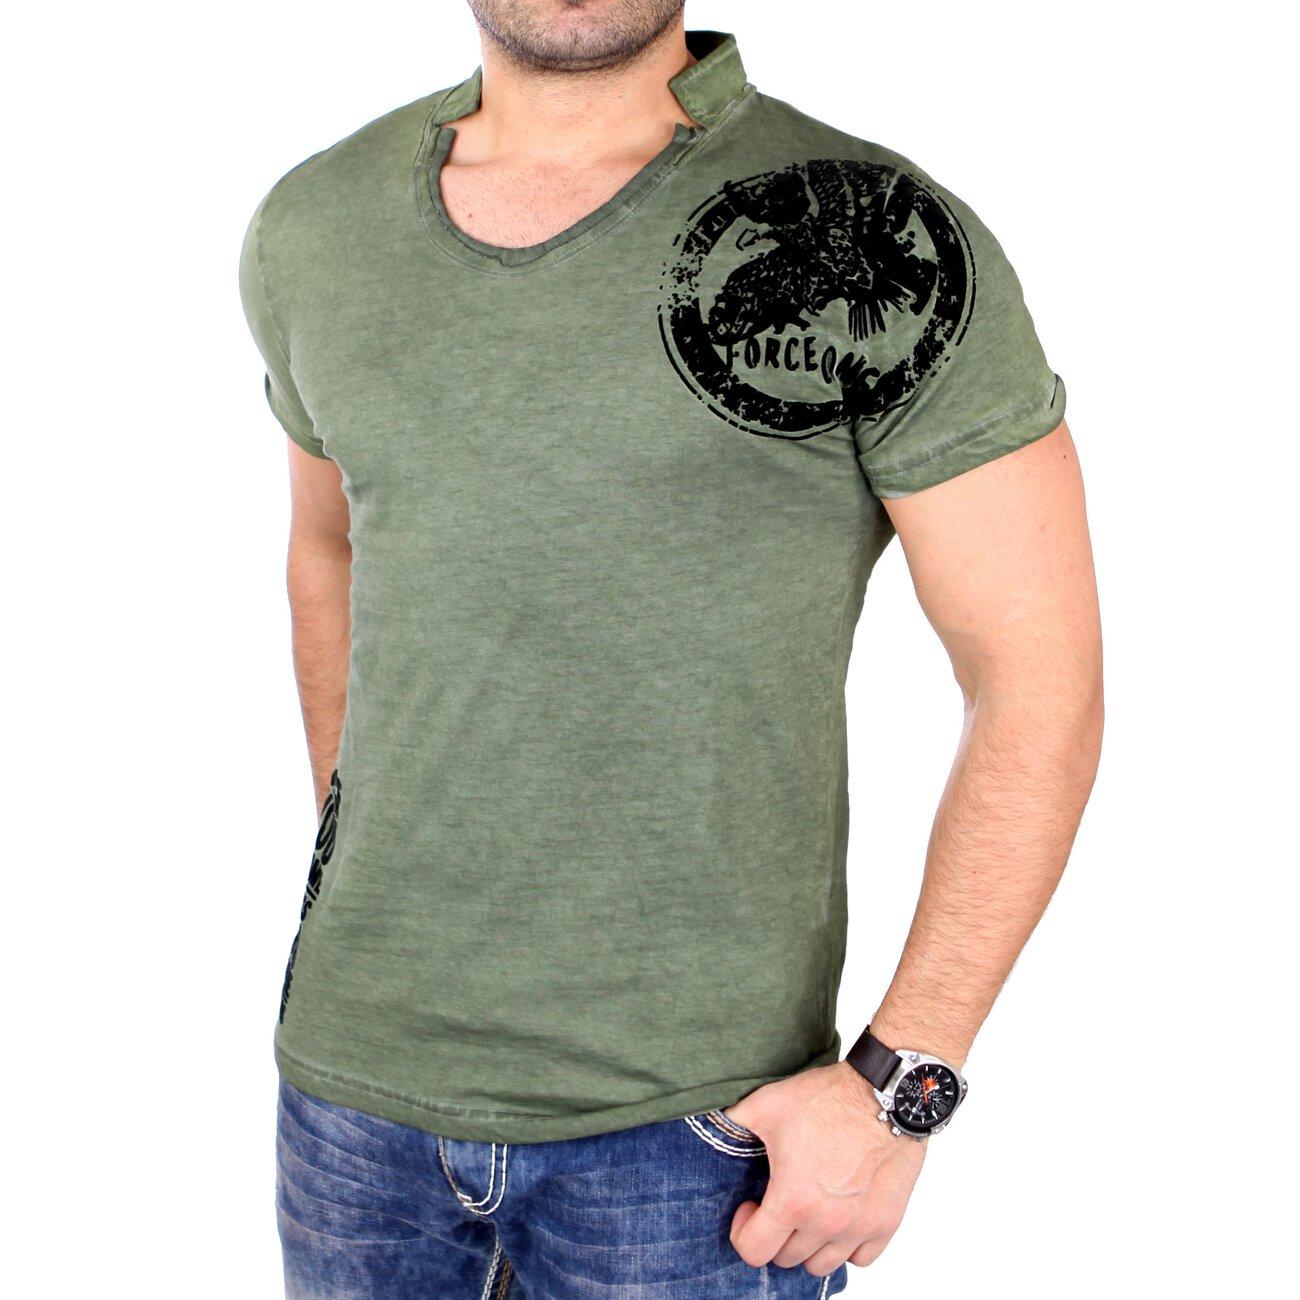 Tazzio T Shirt Herren Vintage Style Flockprint Kurzarmshirt